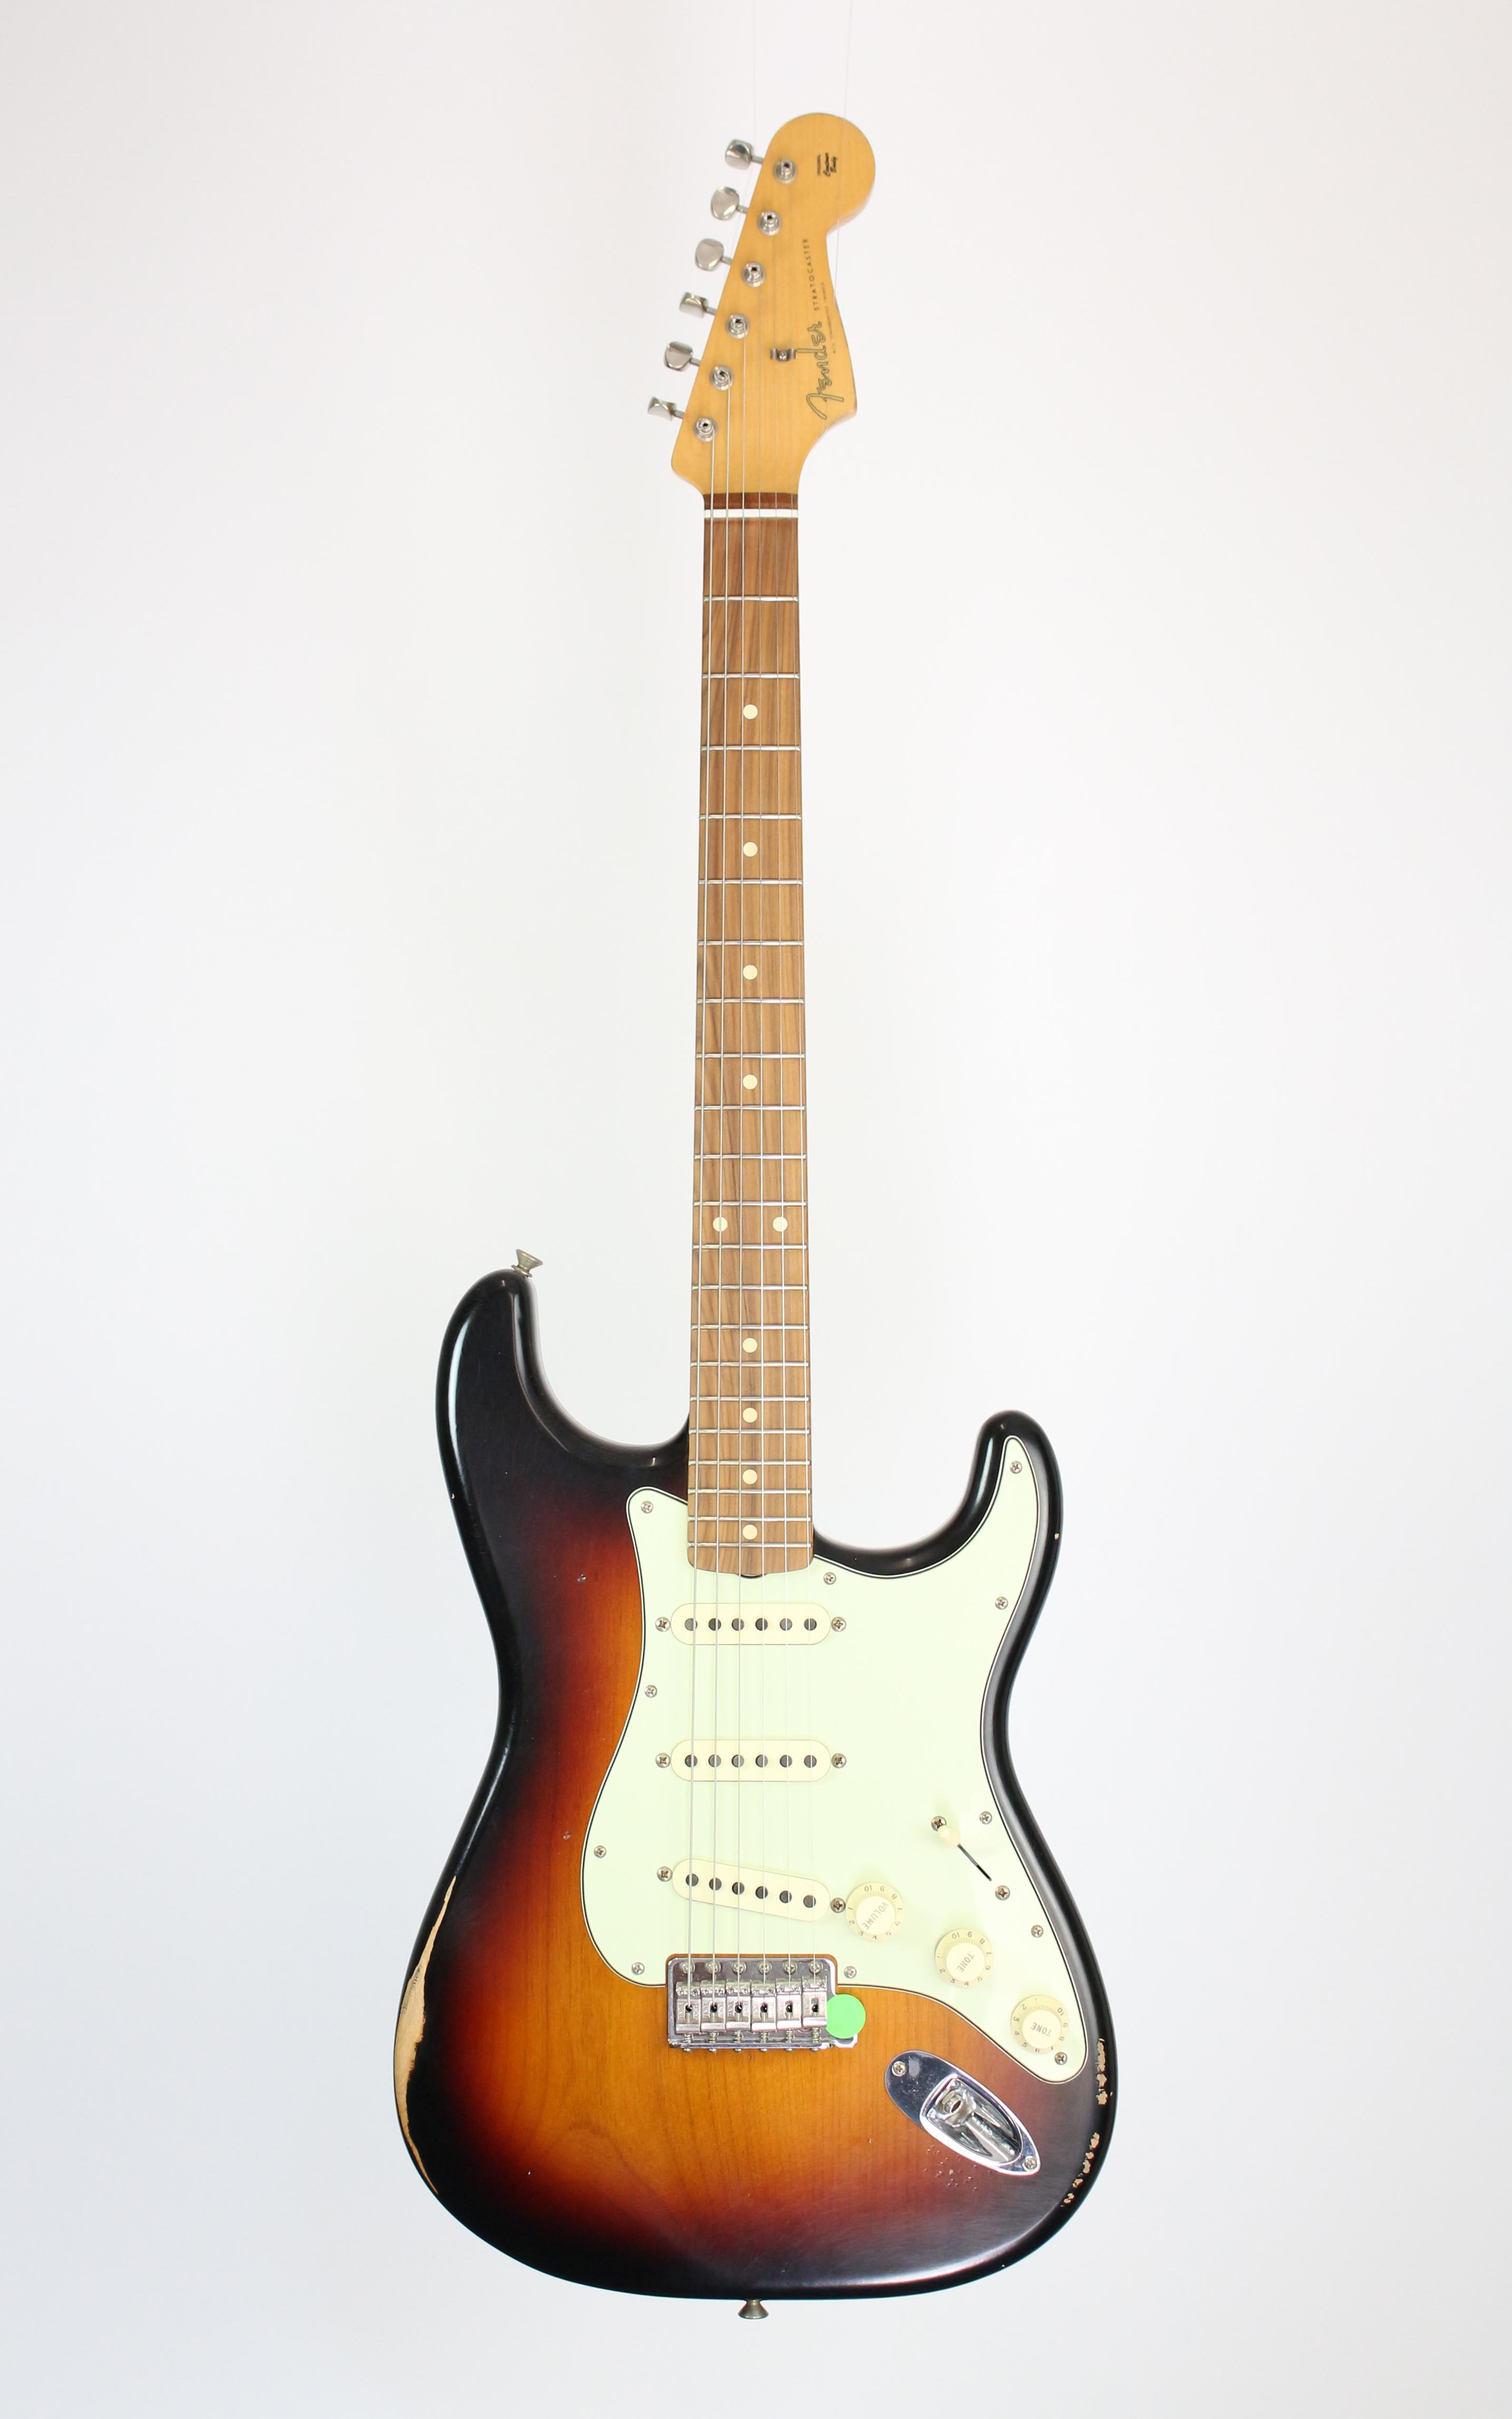 Fender - Road Worn 60s Strat PF 3TSB - Gitarren - E-Gitarren | MUSIK BERTRAM Deutschland Freiburg